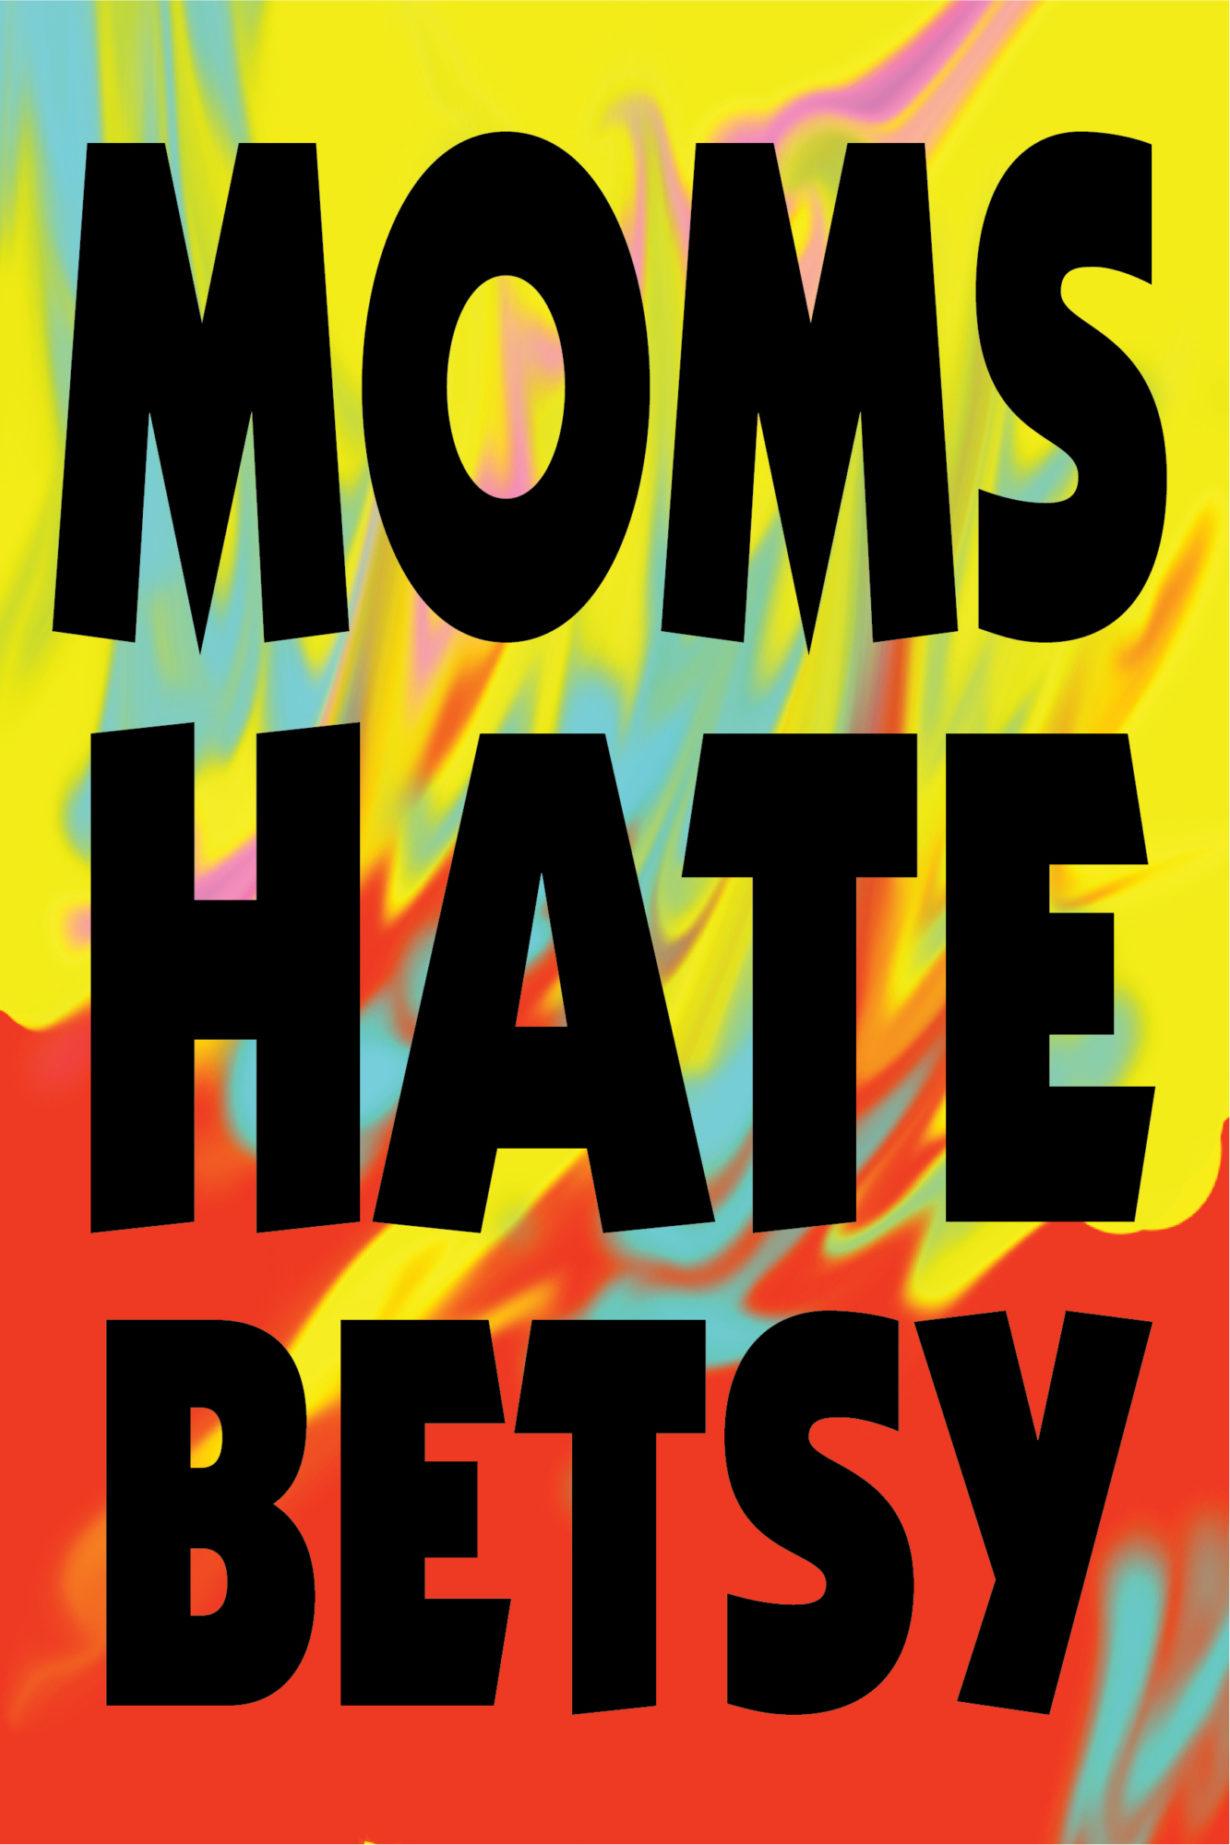 NP_01_25_2017_Moms-Hate-Betsy.jpg